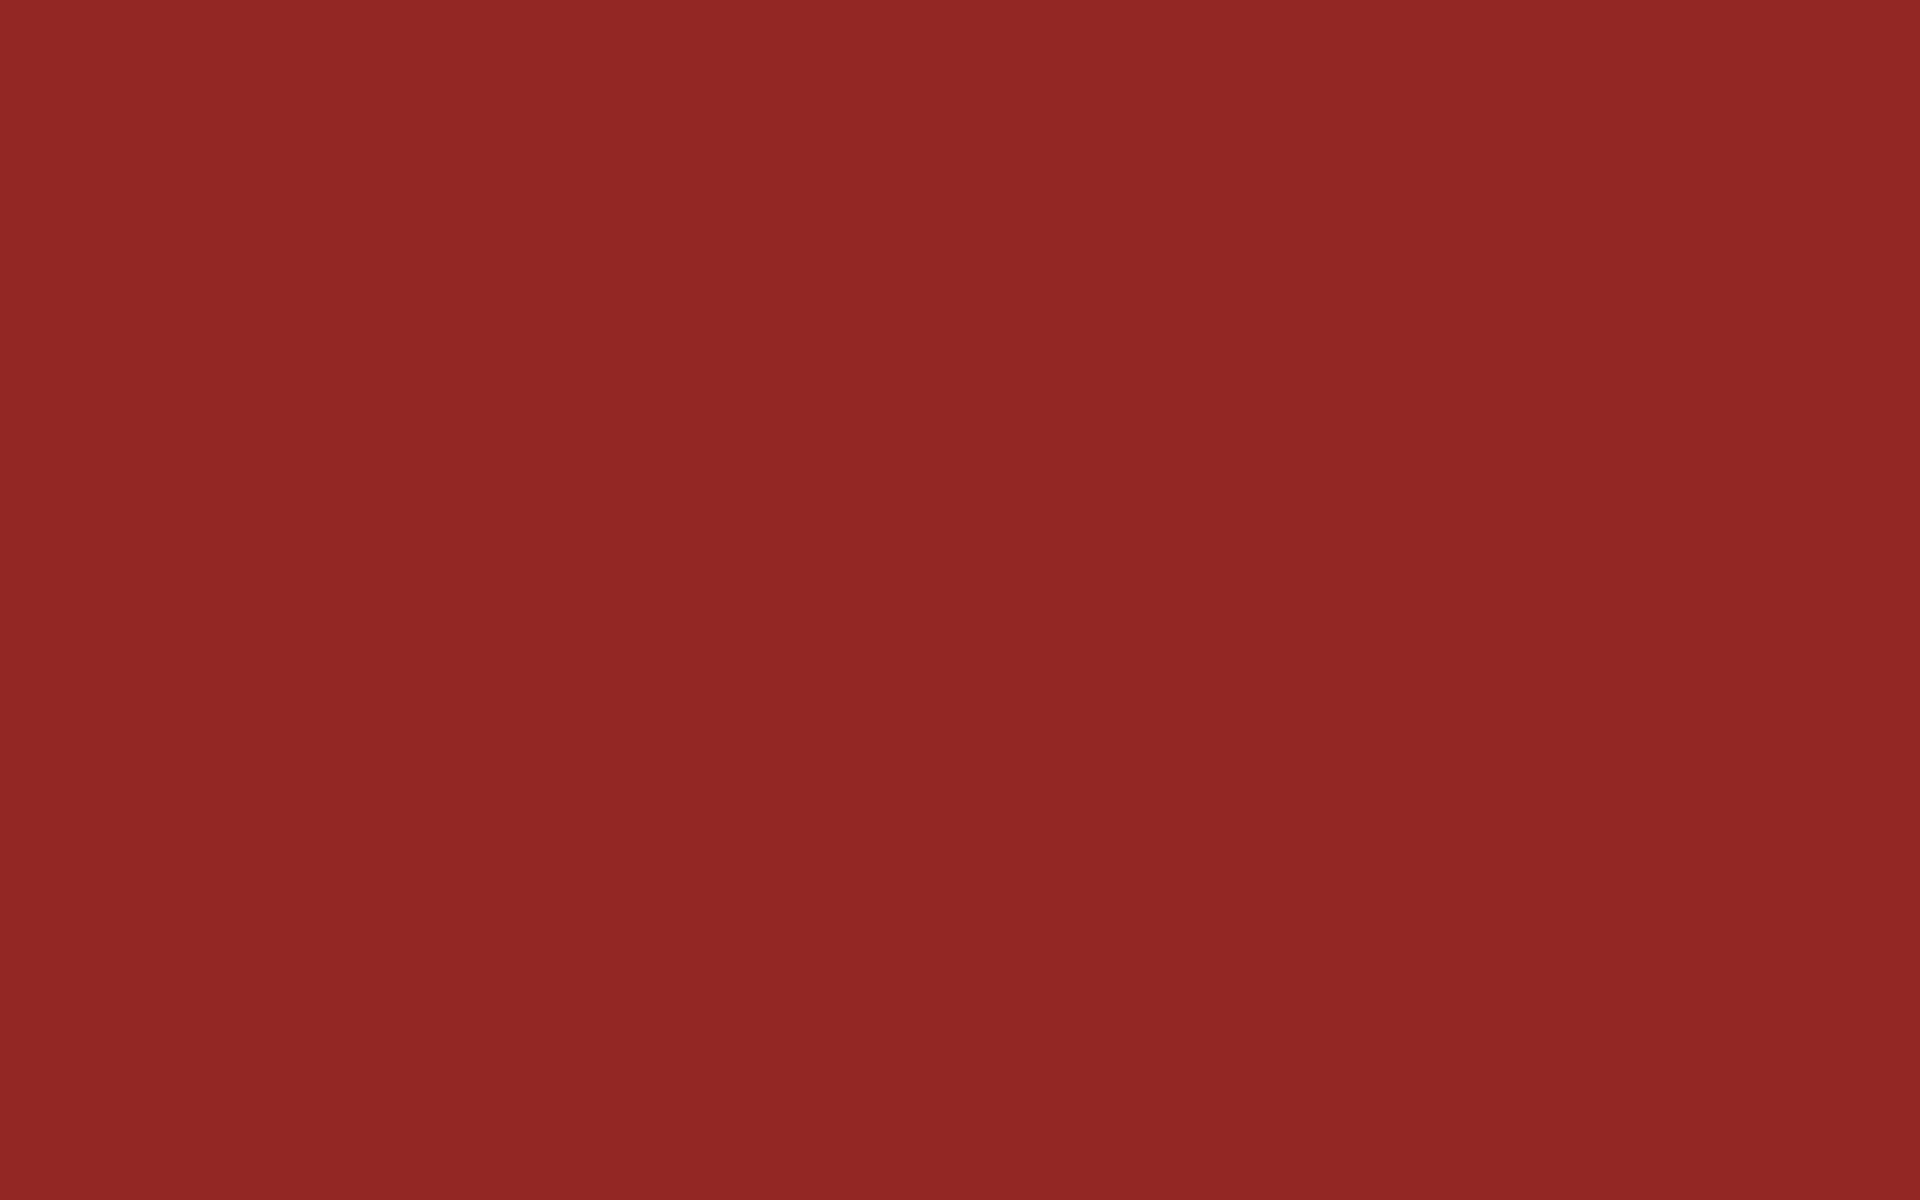 1920x1200 Vivid Auburn Solid Color Background